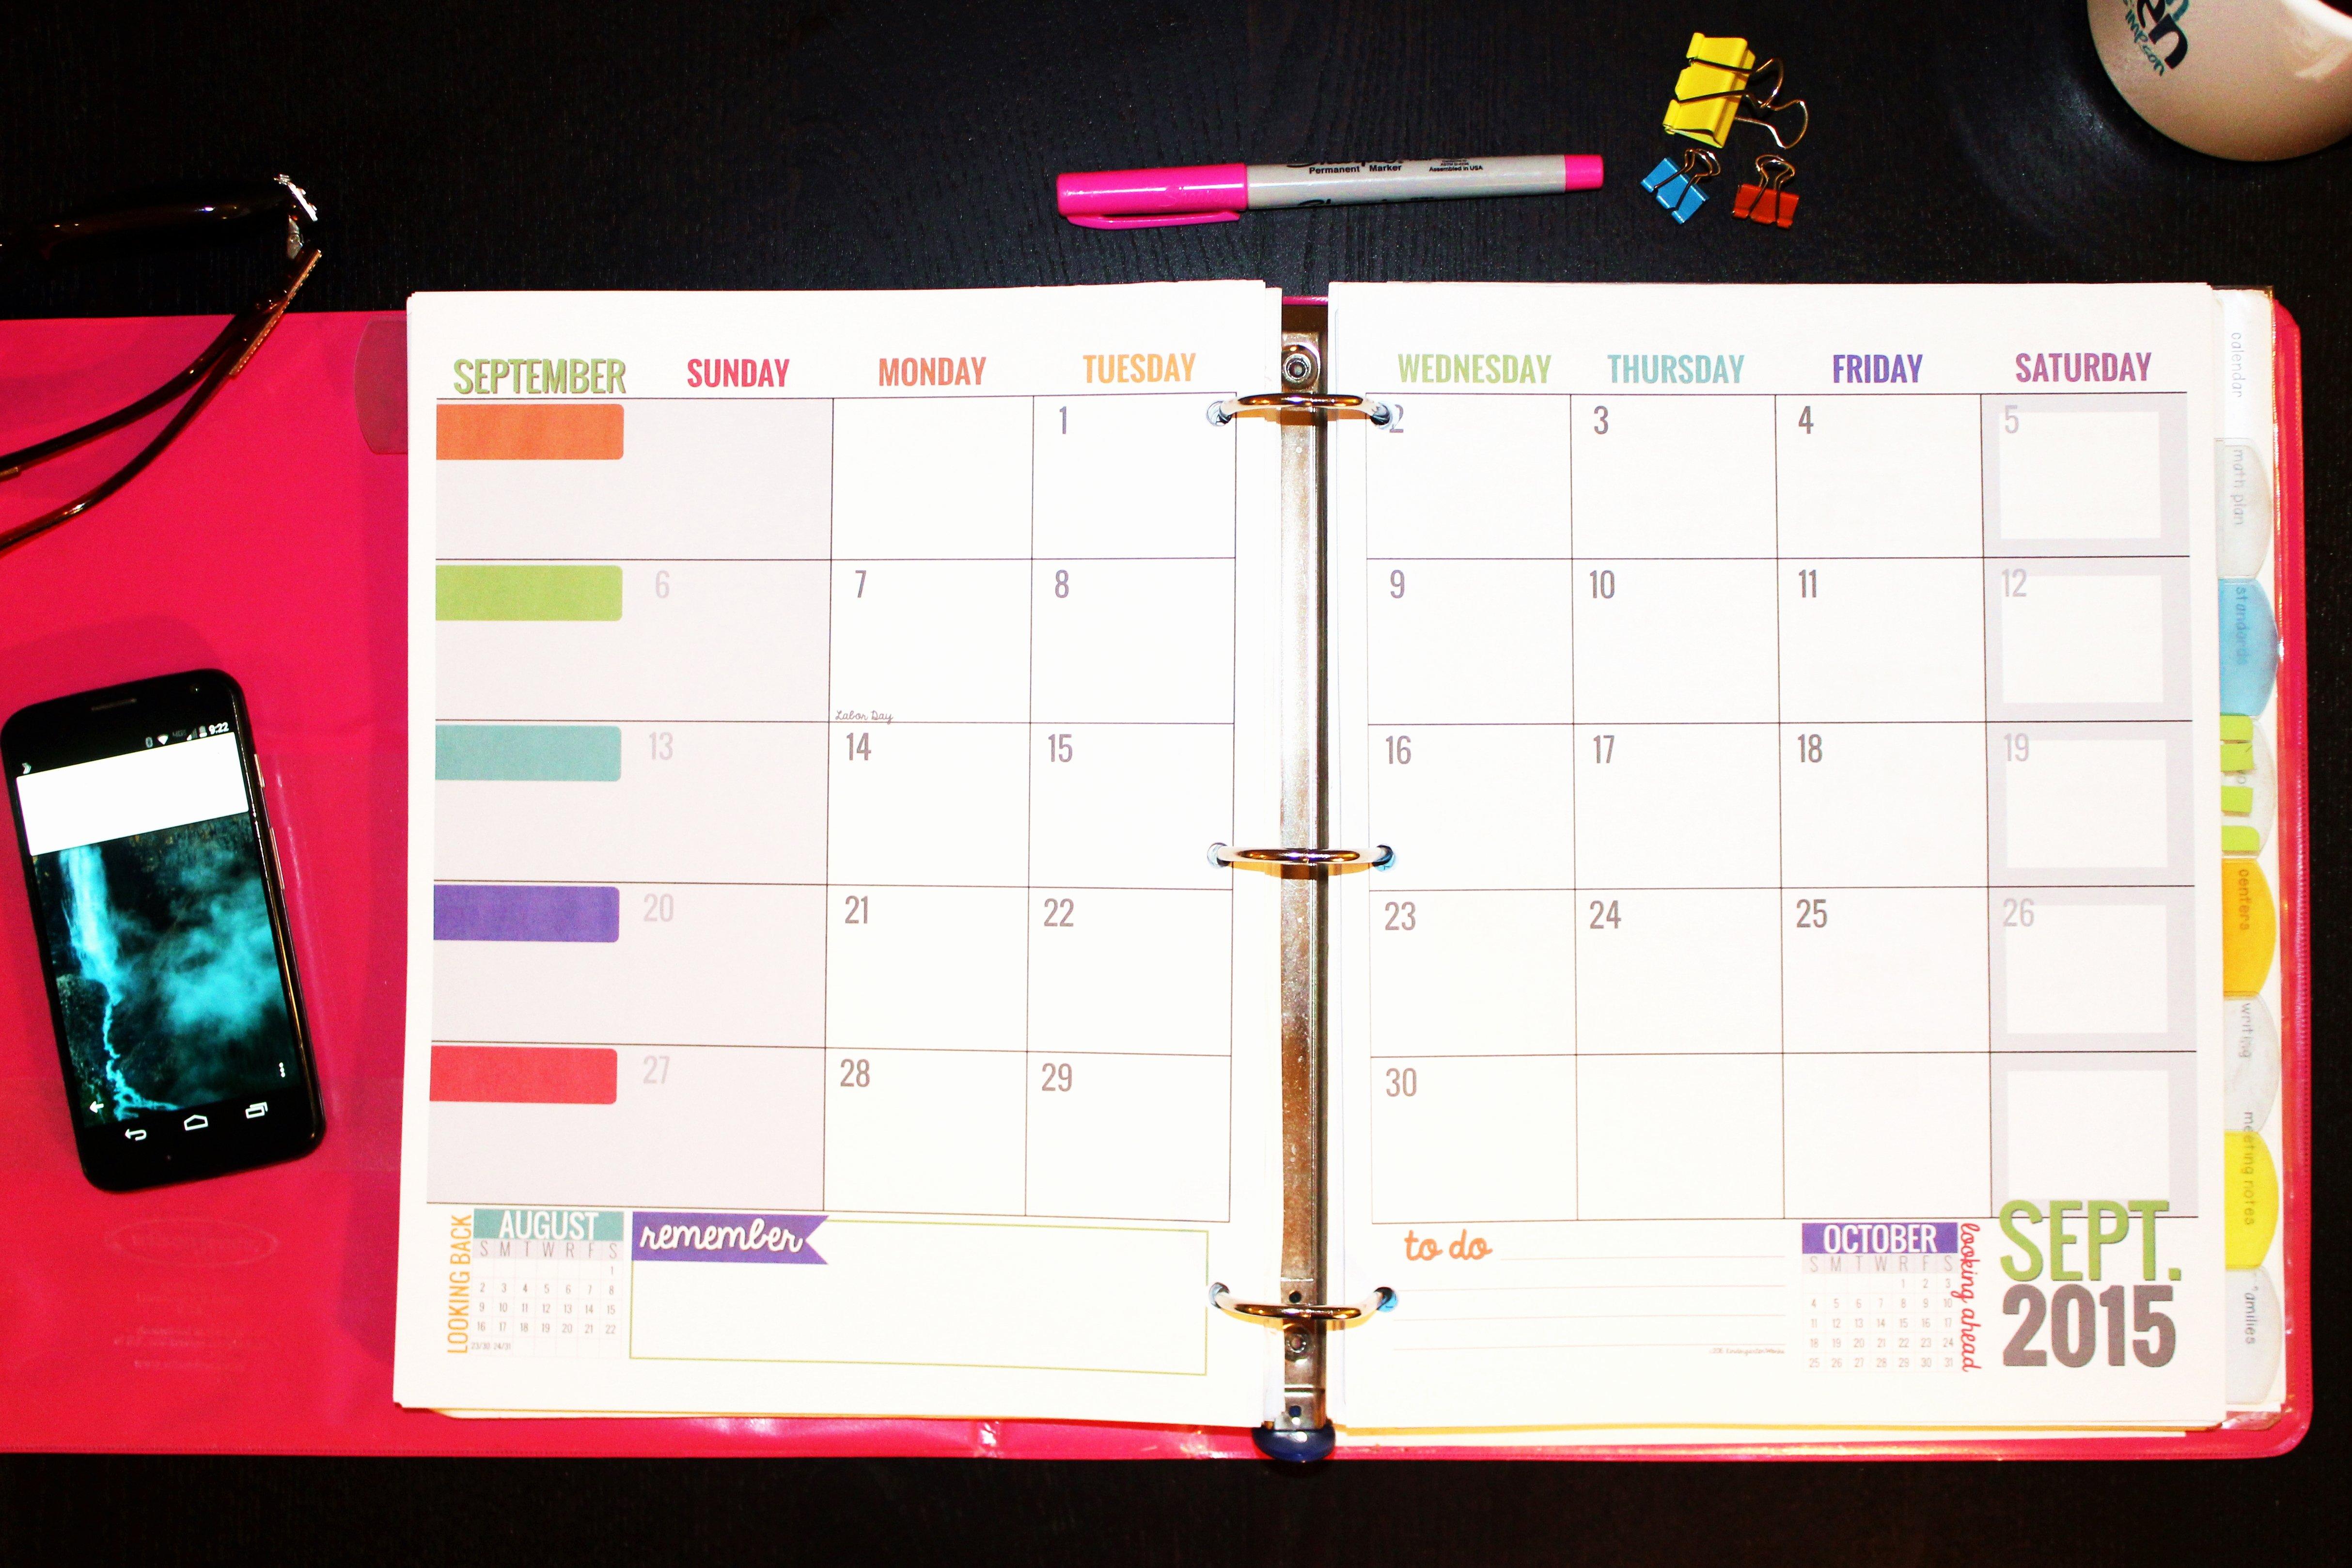 Teacher Daily Schedule Template Elegant Free Printable Calendar Templates for Teachers